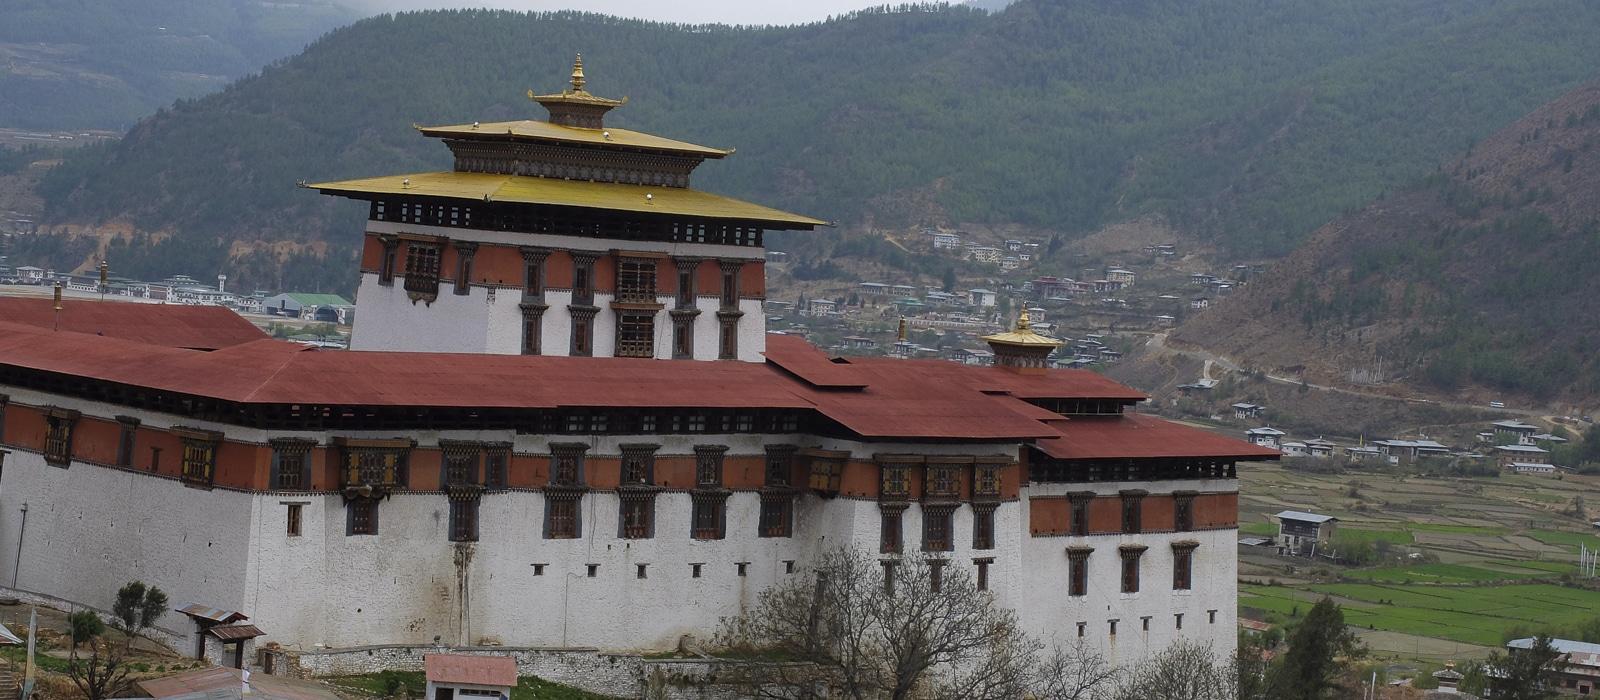 img-diapo-entete - Nepal-bouthan-1600x700-10.jpg